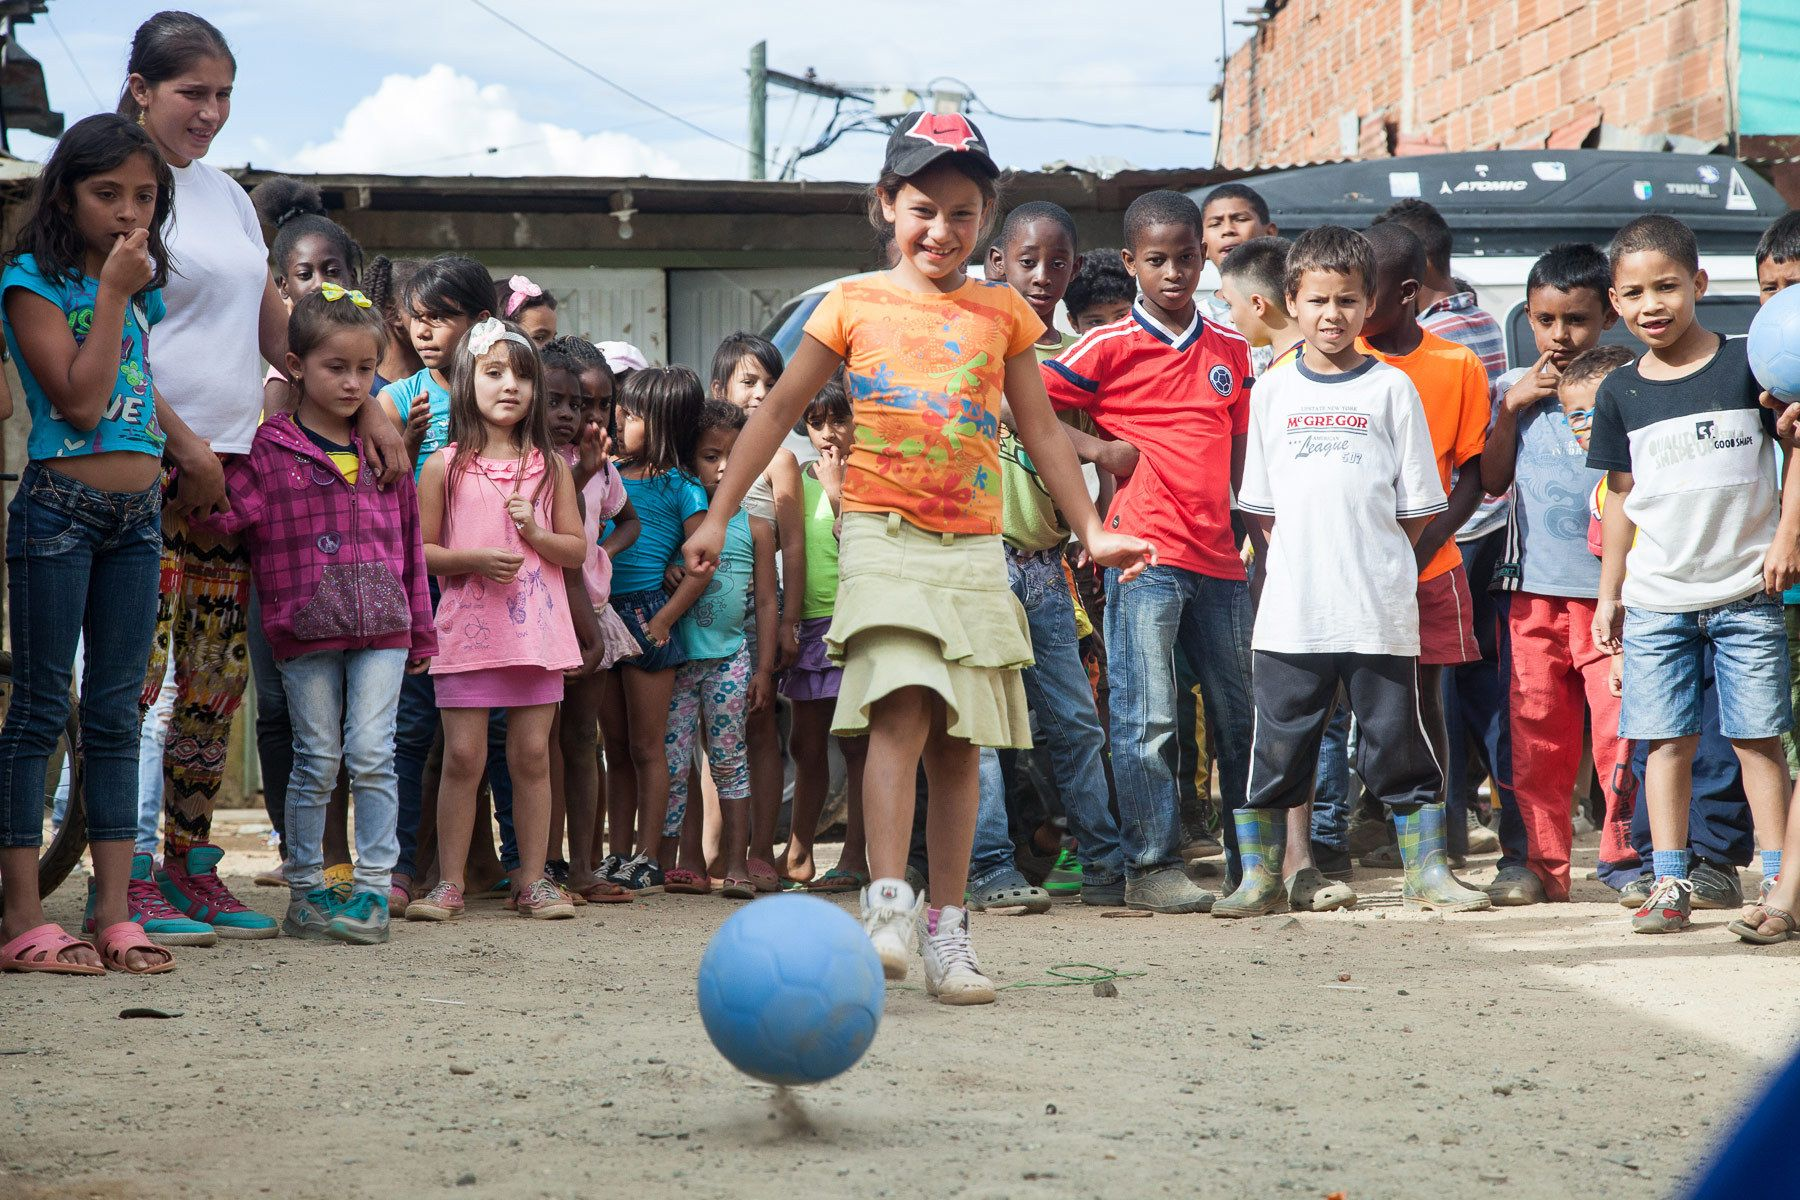 1columbia_0436.jpg